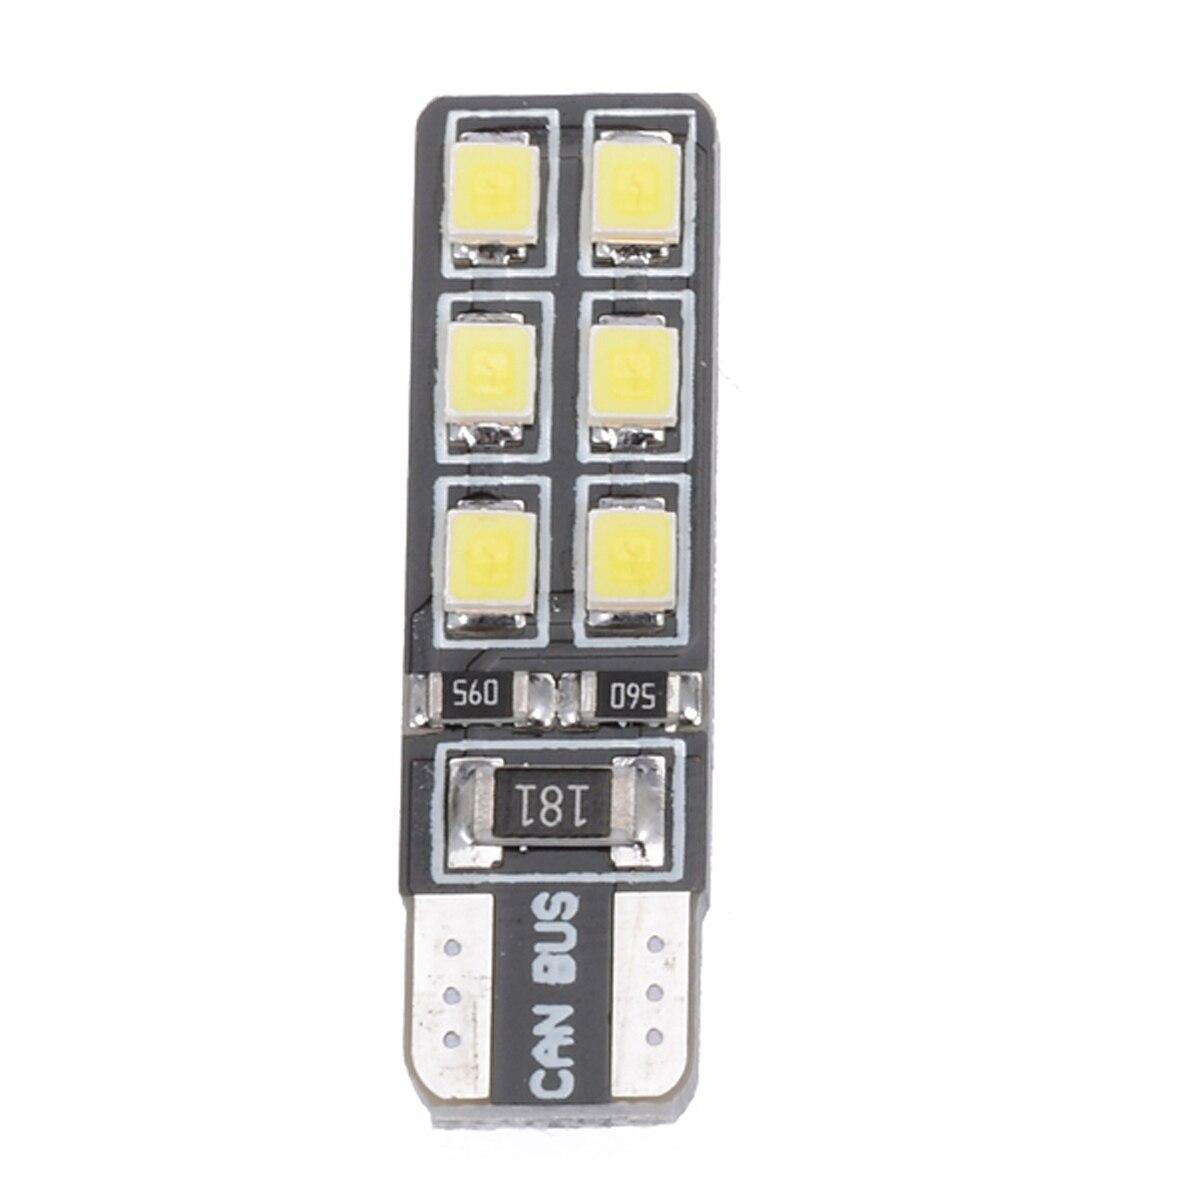 6Pcs T10 194 168 2835 12LED Canbus Error Free Side Marker Light Map Bulbs White